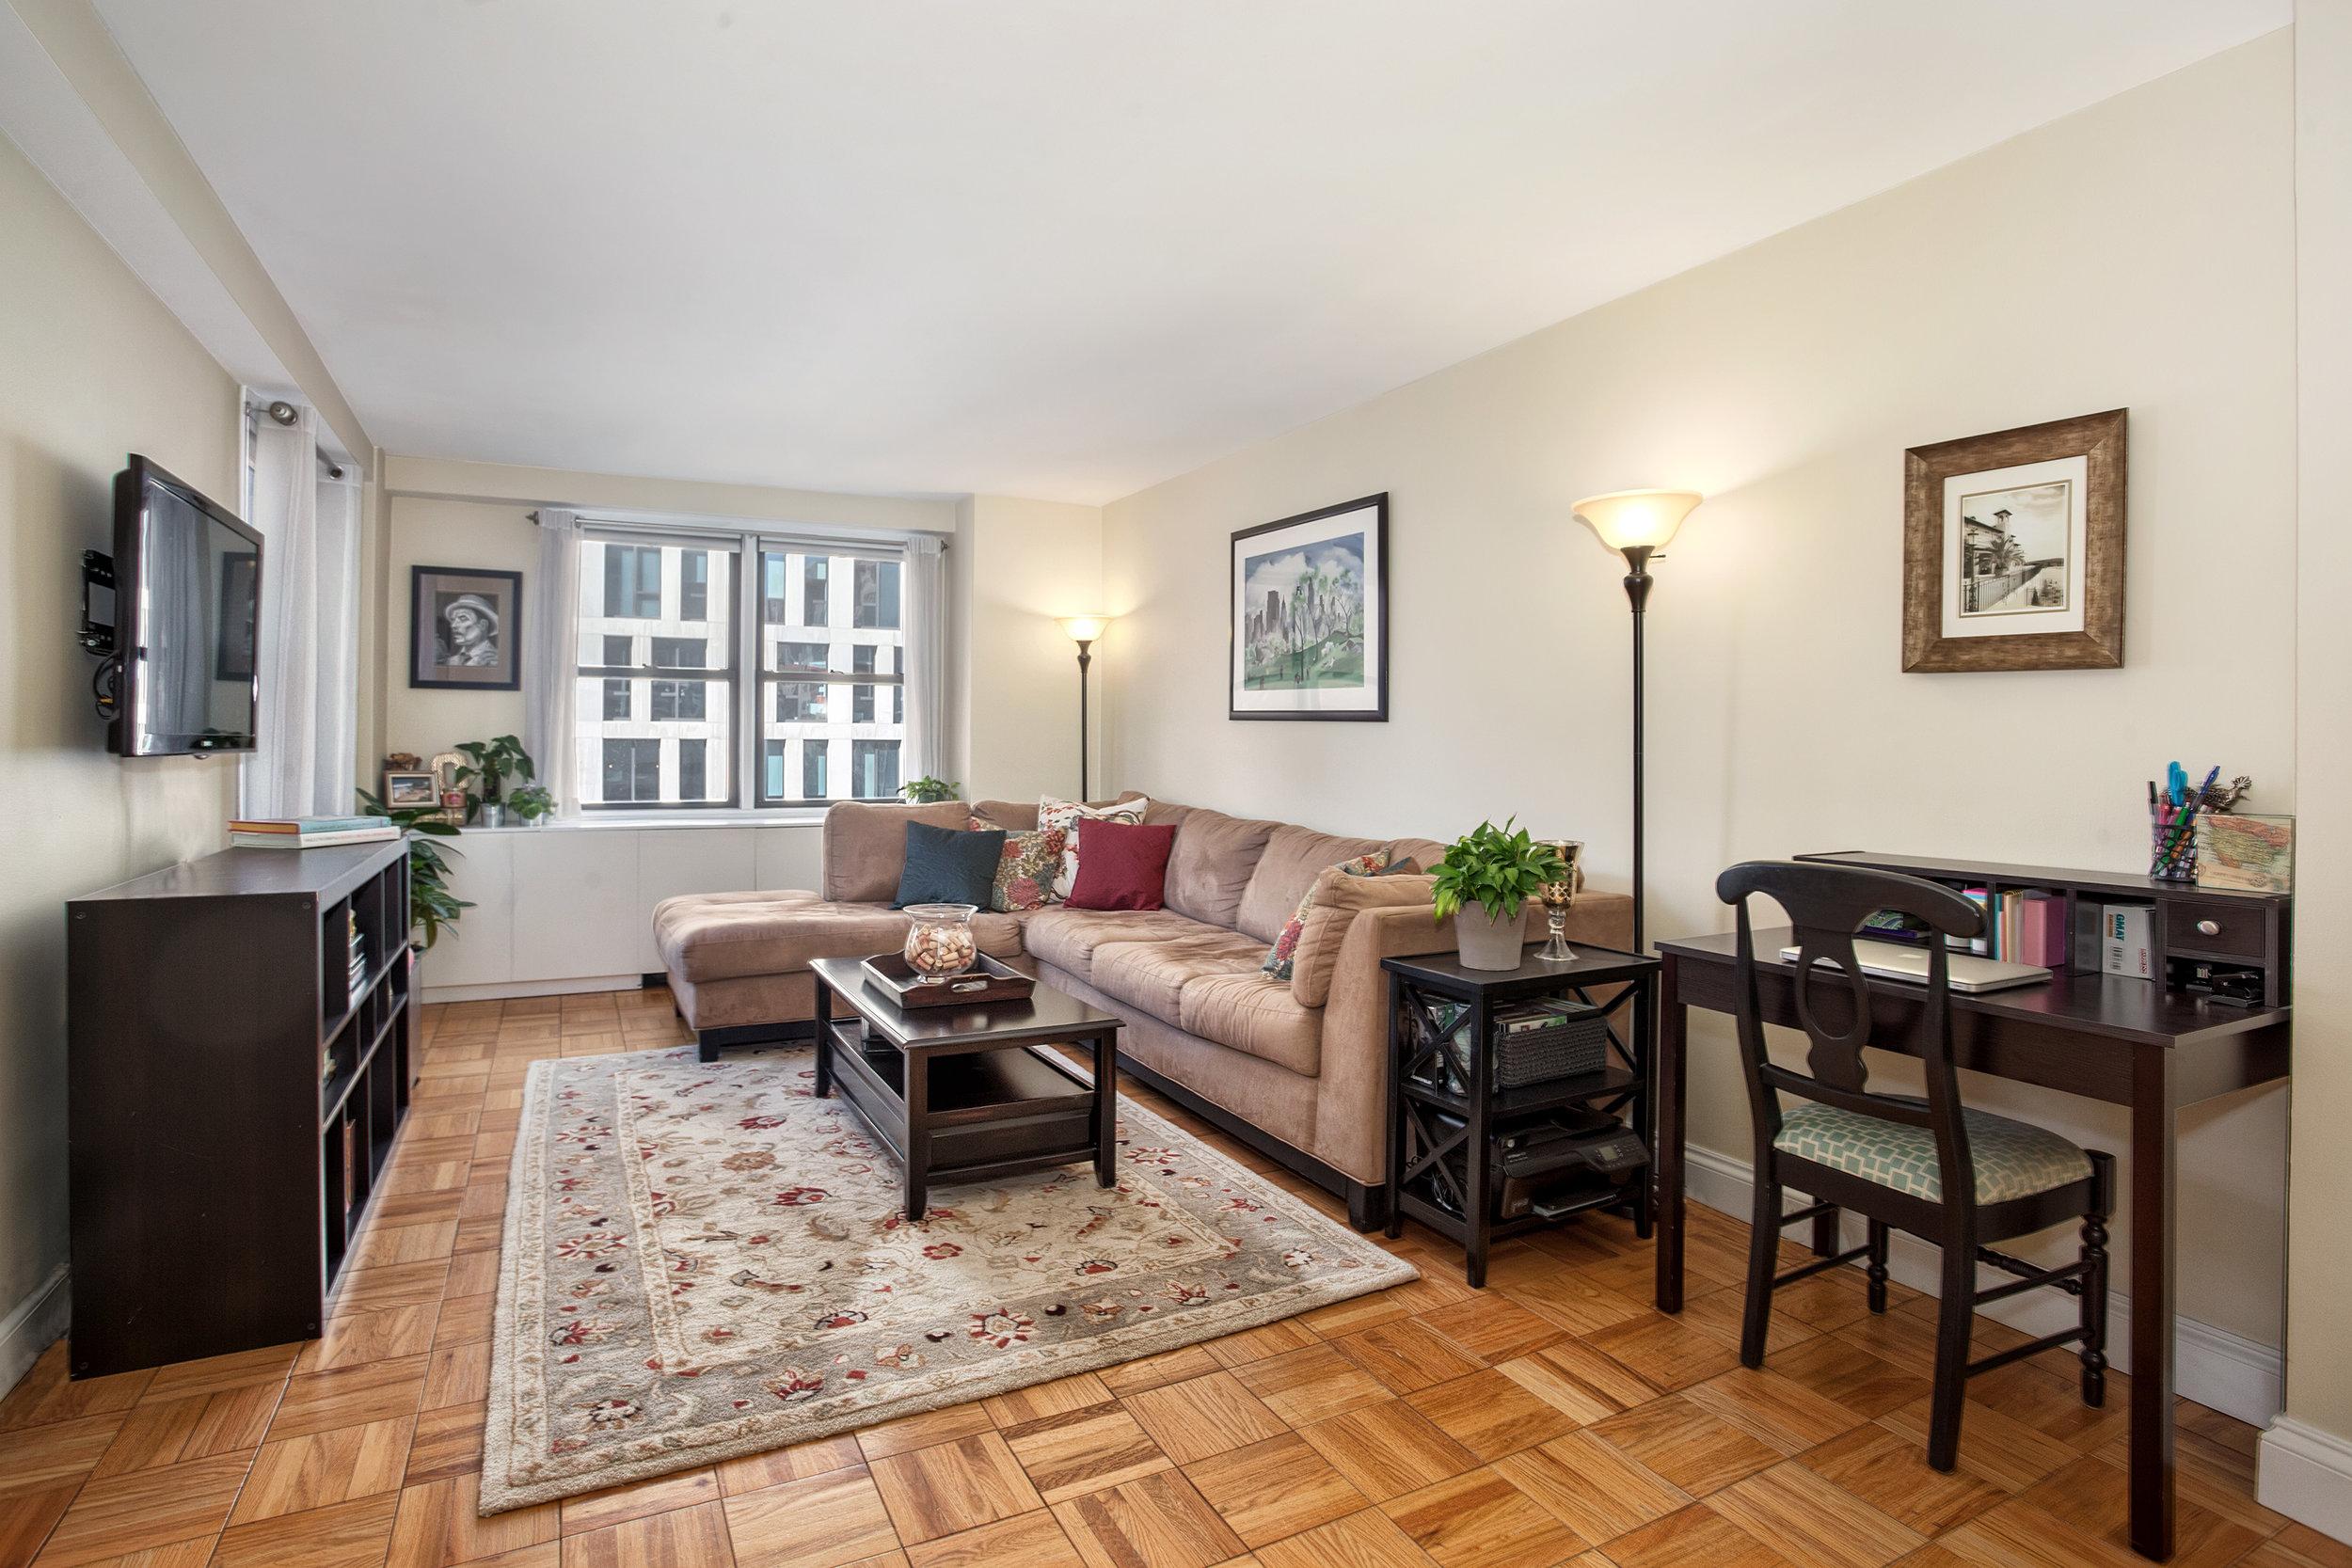 201 East 21st Street, Unit 7D - $799,000